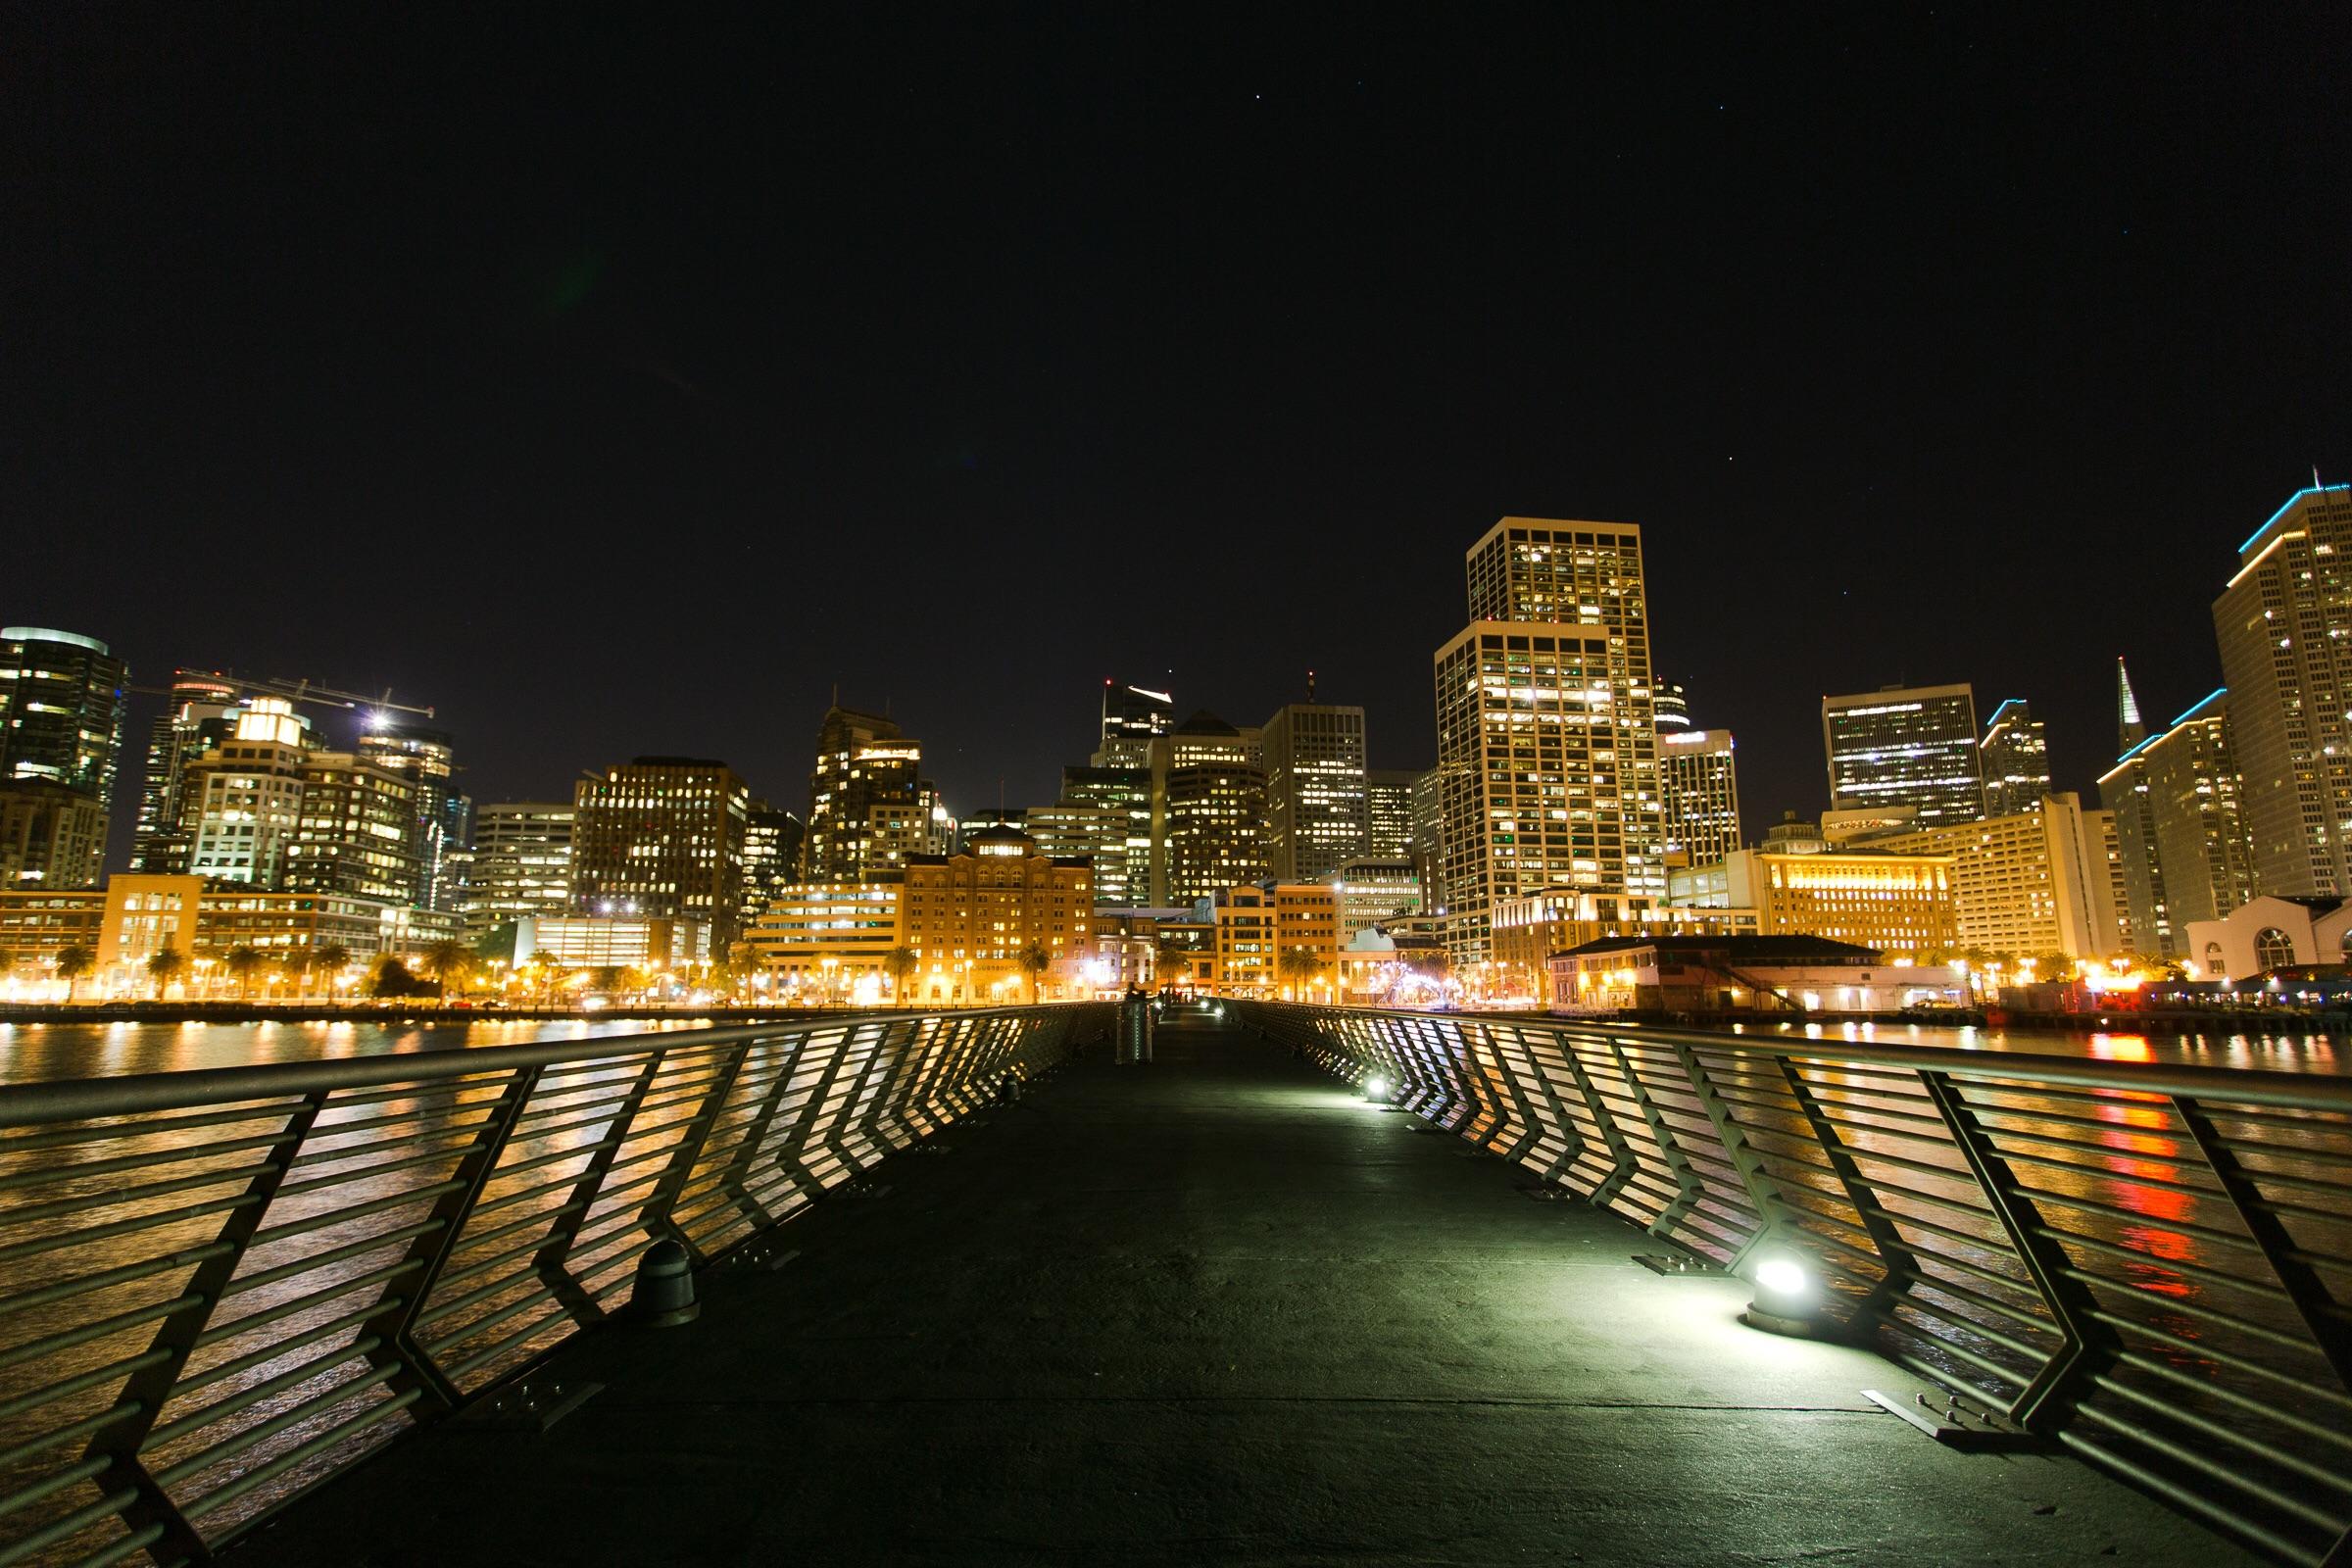 Pier 14 in San Francisco night skyline. Canon 17mm, 8 sec exposure.